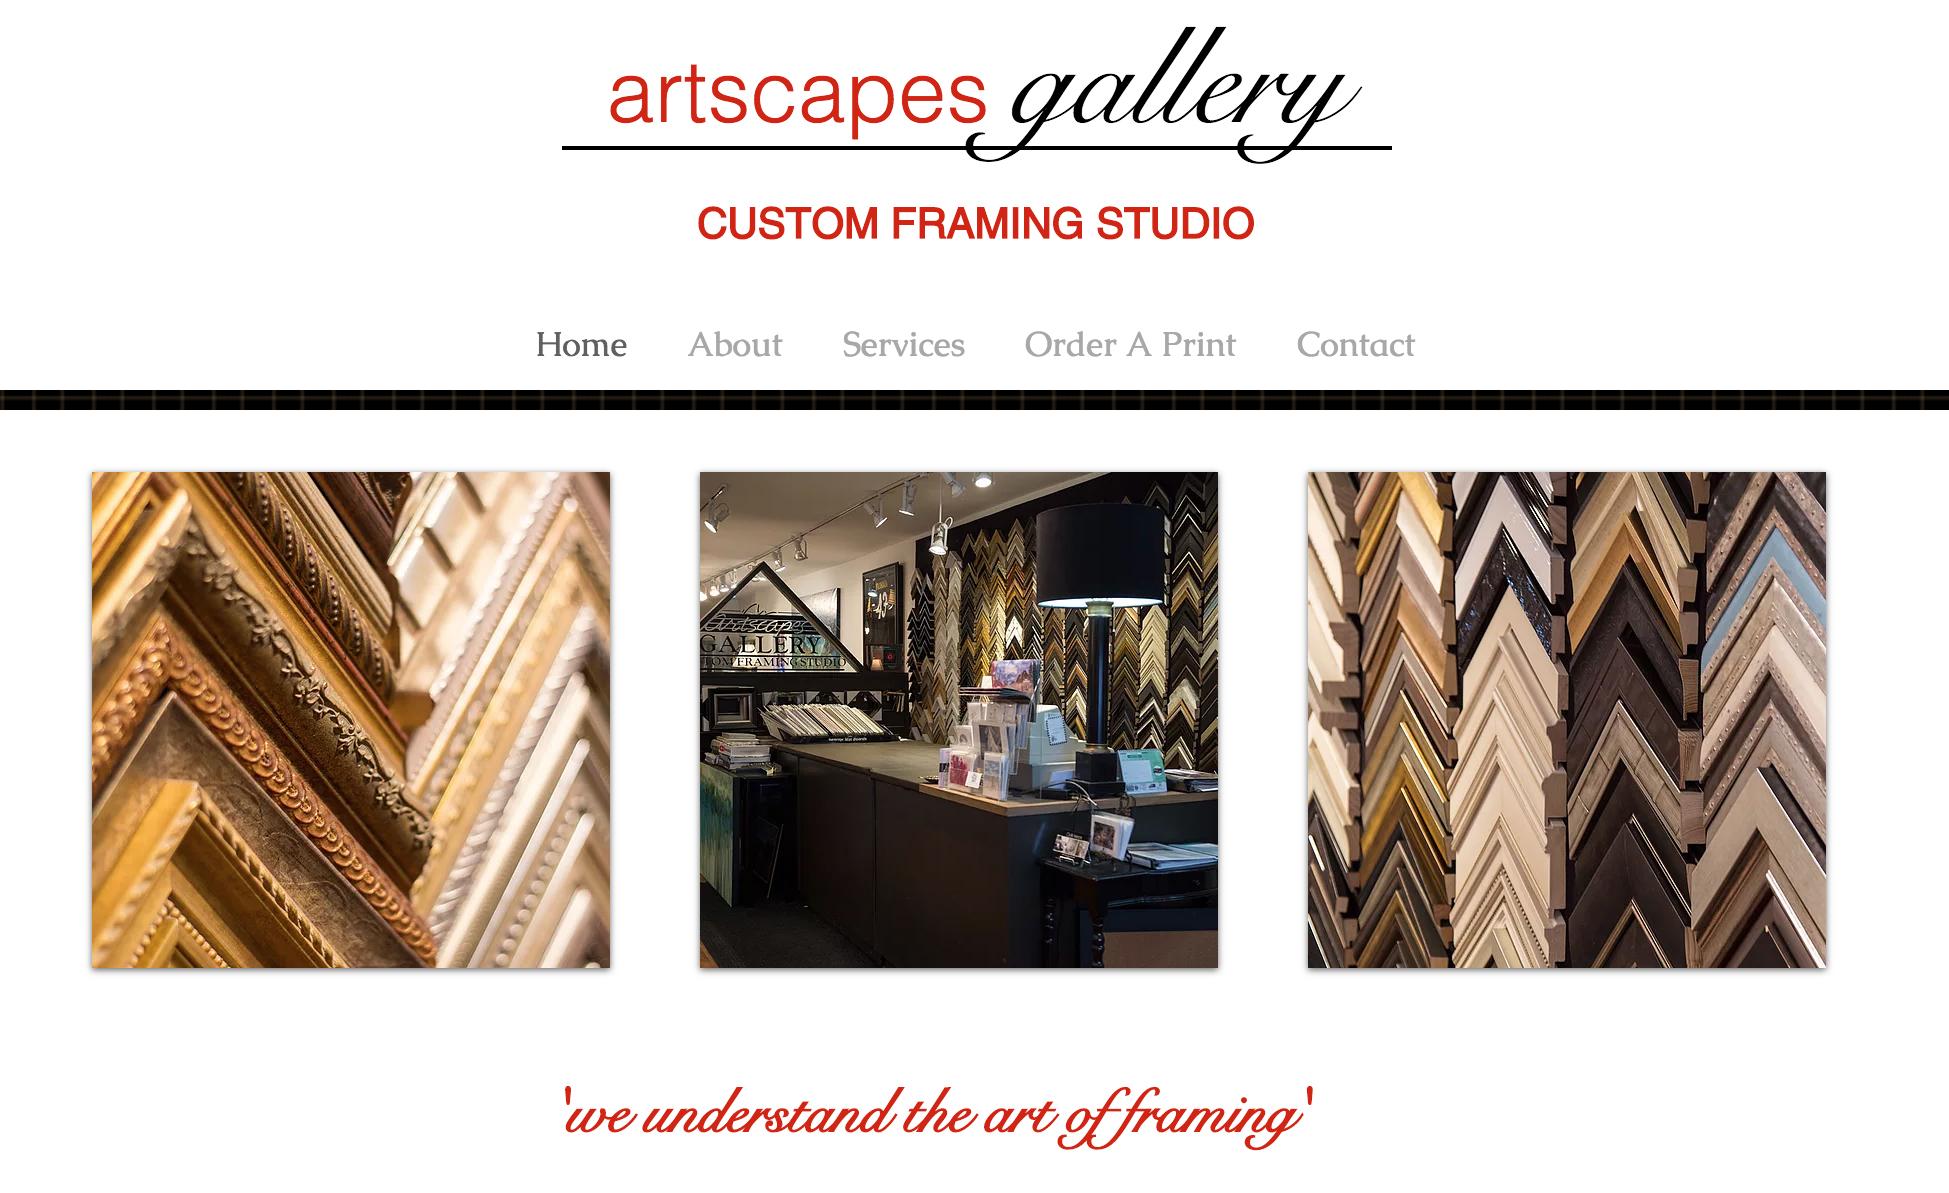 artscapes web page.jpg